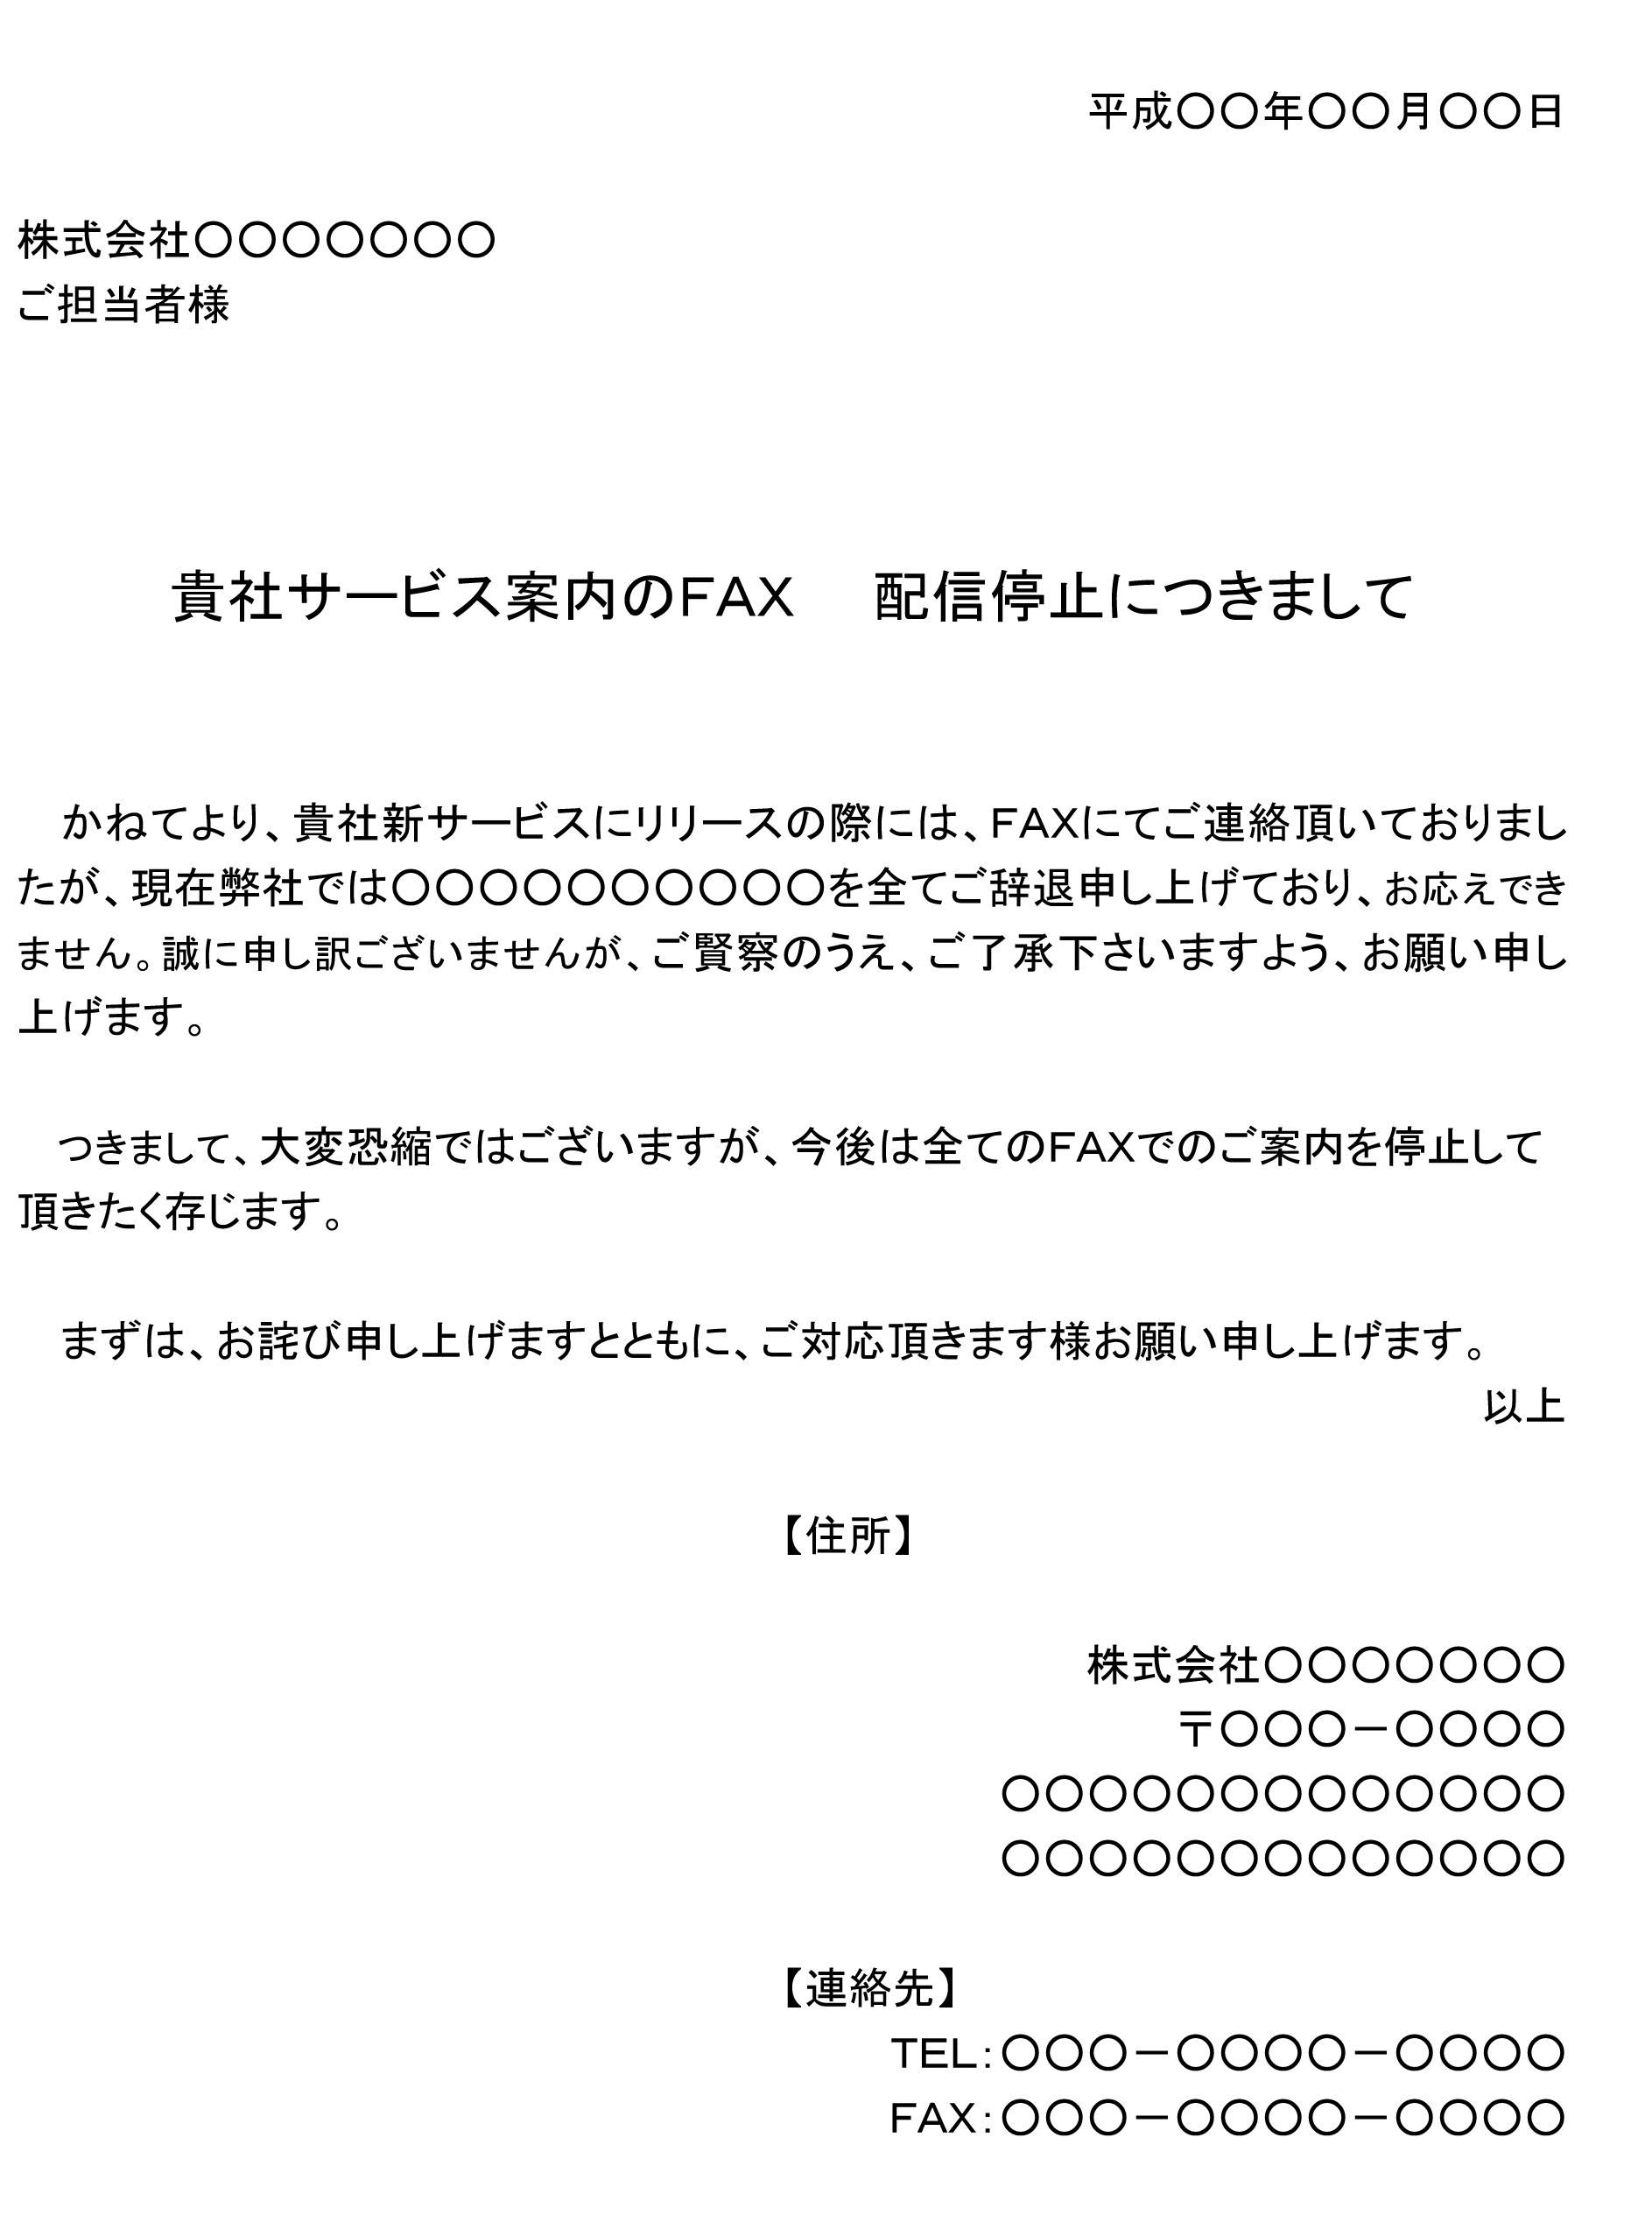 断り状(FAX配信停止)